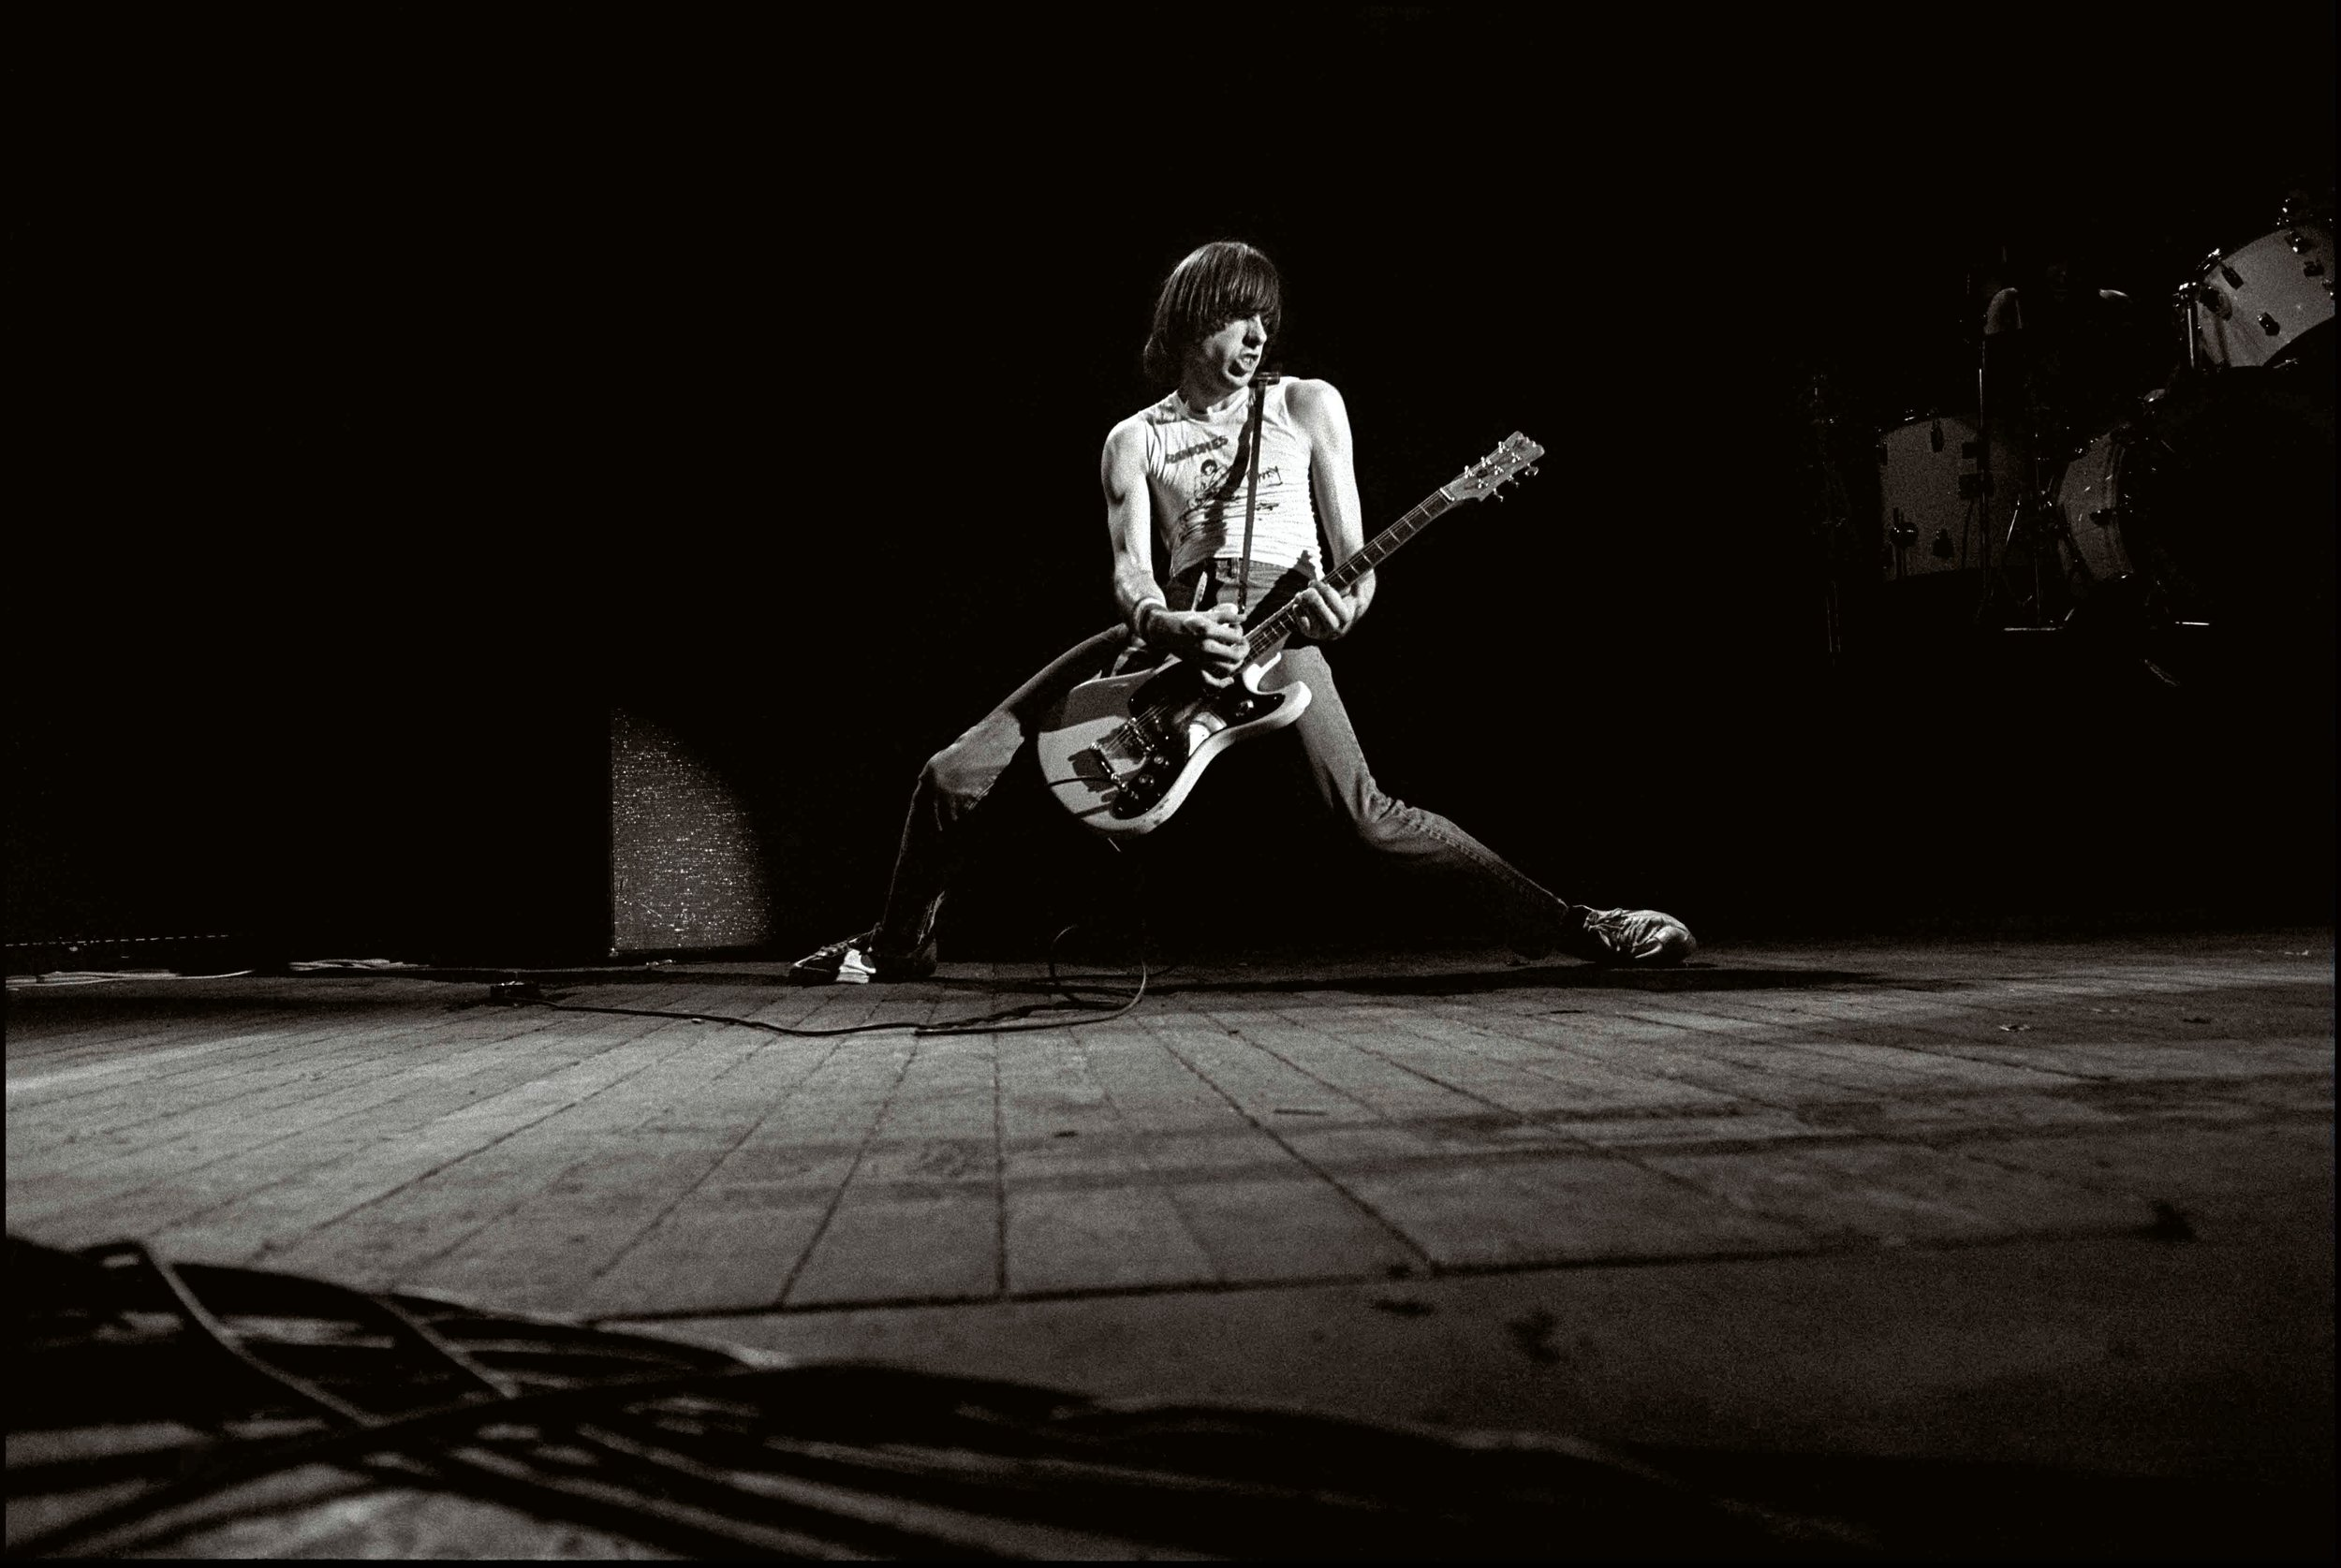 Johnny Ramone performing at Hammersmith Odeon, London, UK 1979